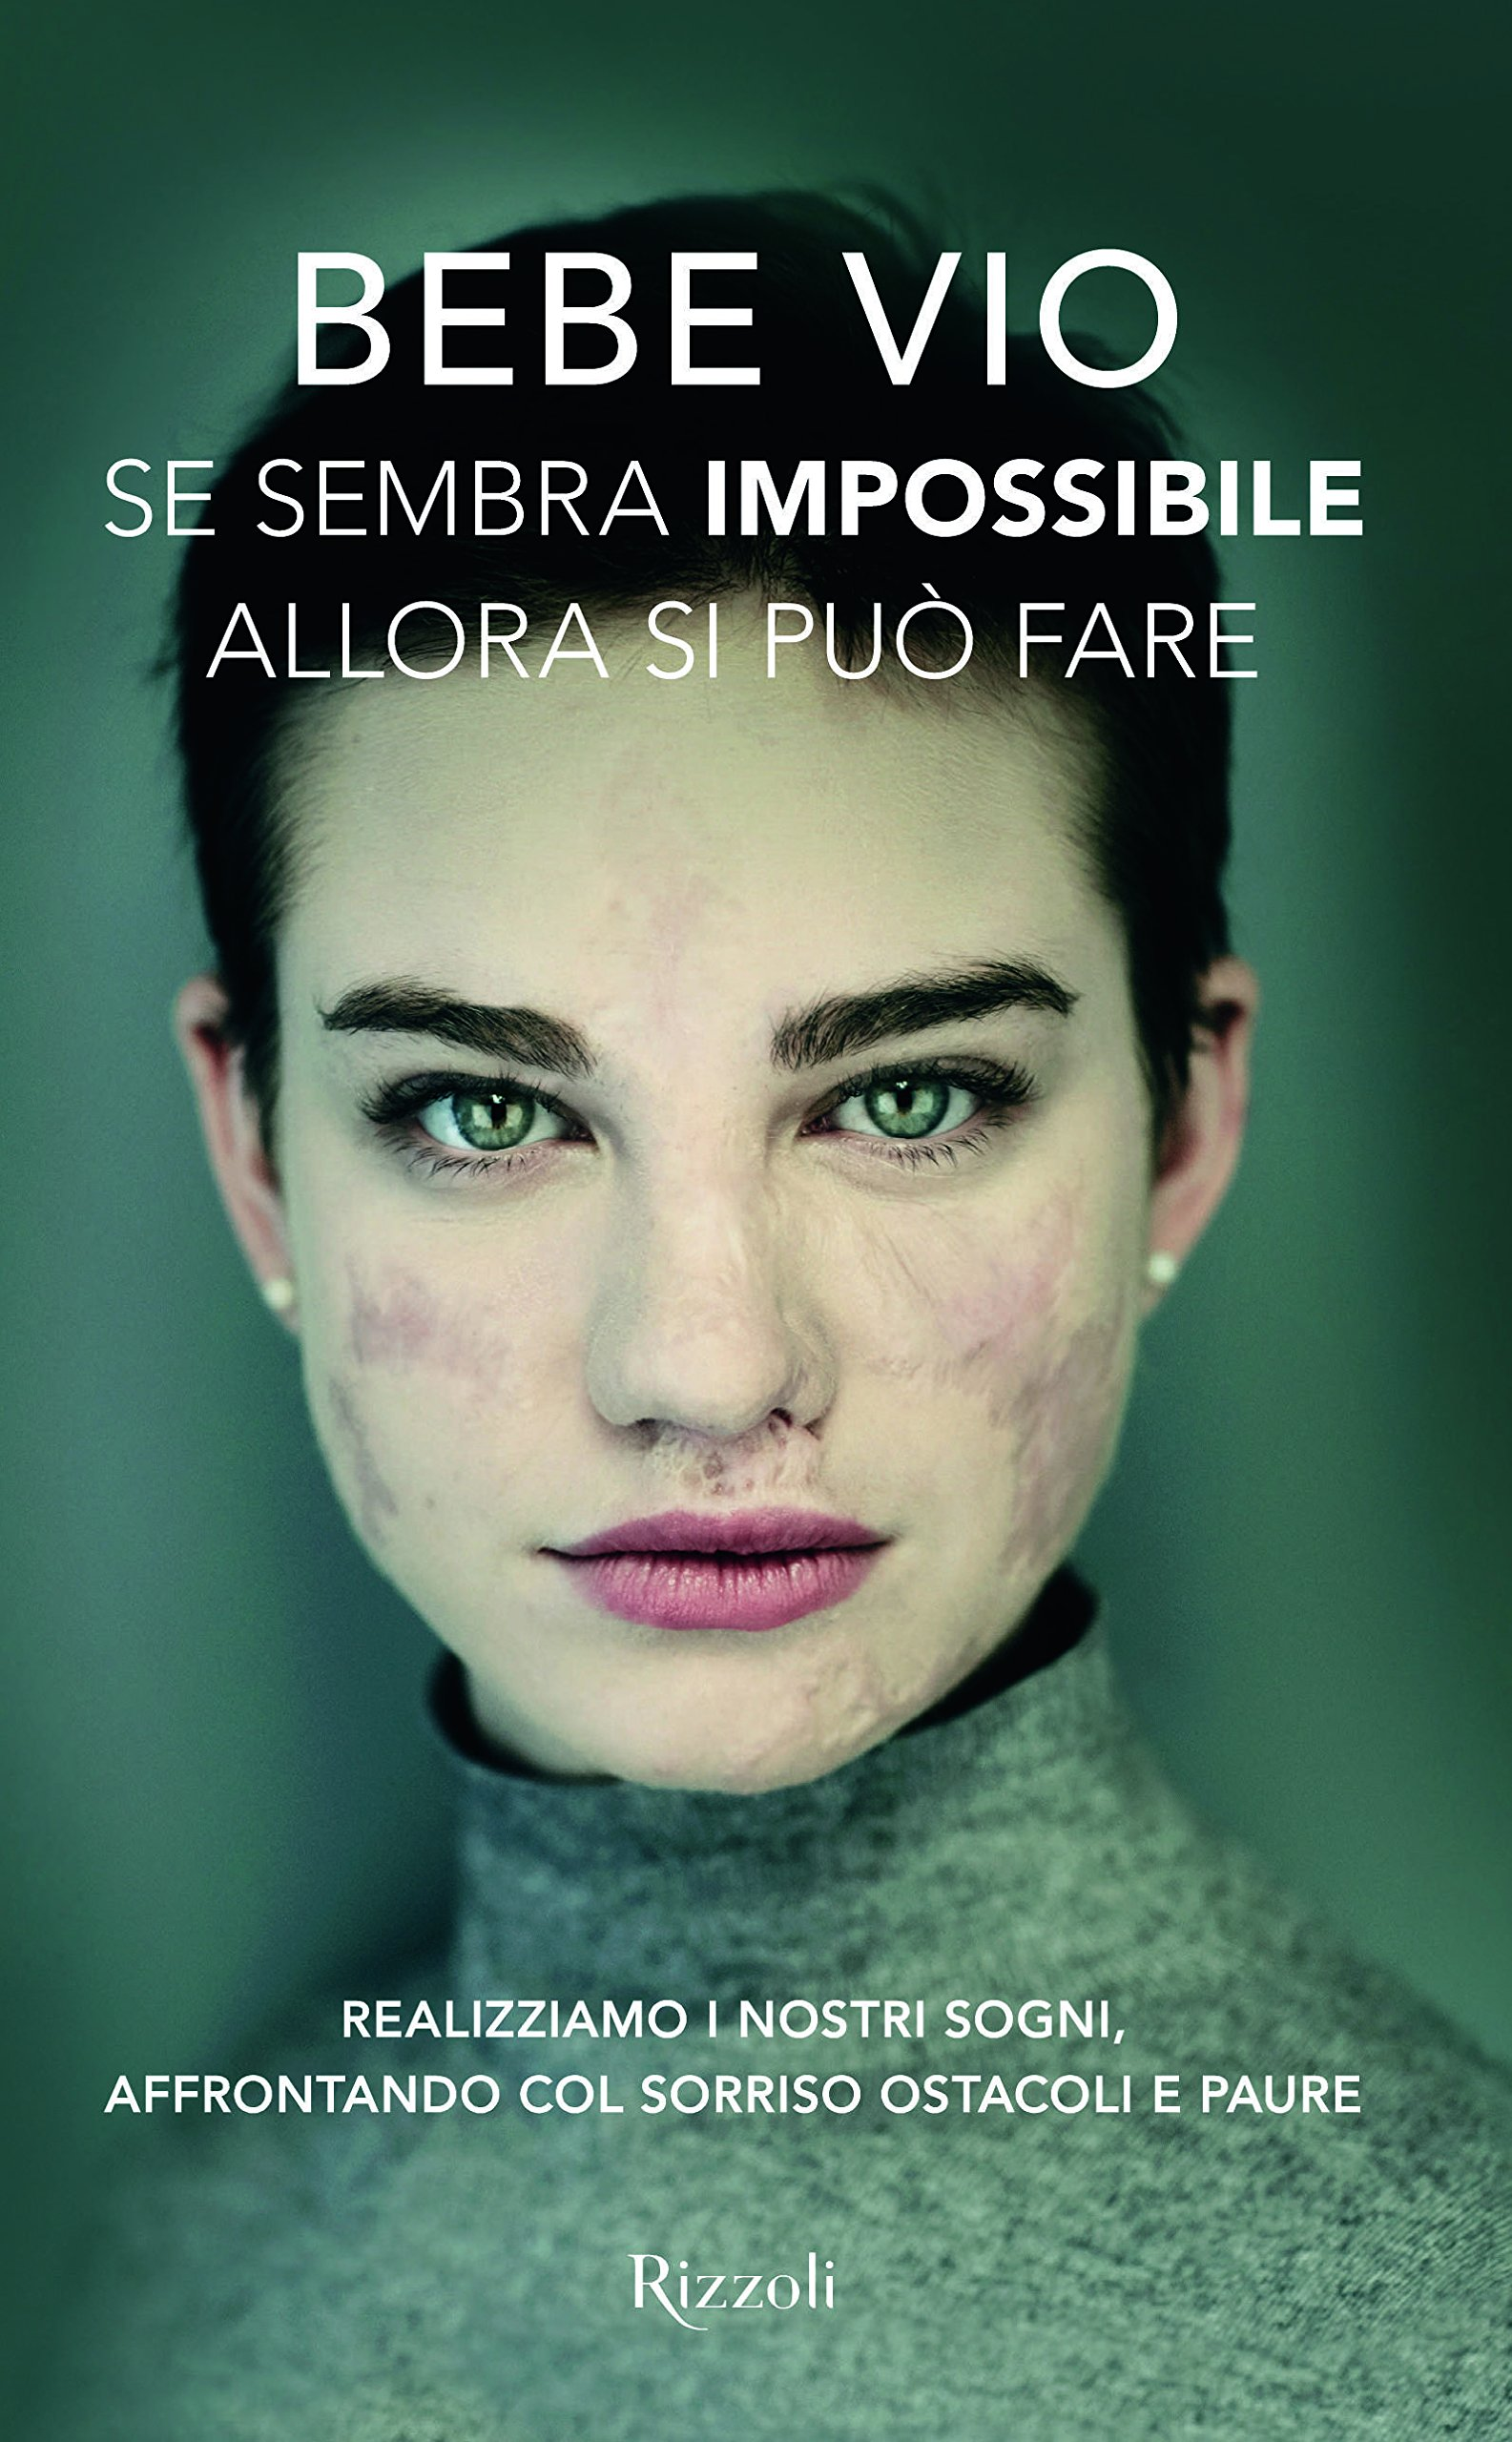 Realizziamo i nostri sogni, affrontando col sorriso ostacoli e paure: Amazon.es: Bebe Vio: Libros en idiomas extranjeros